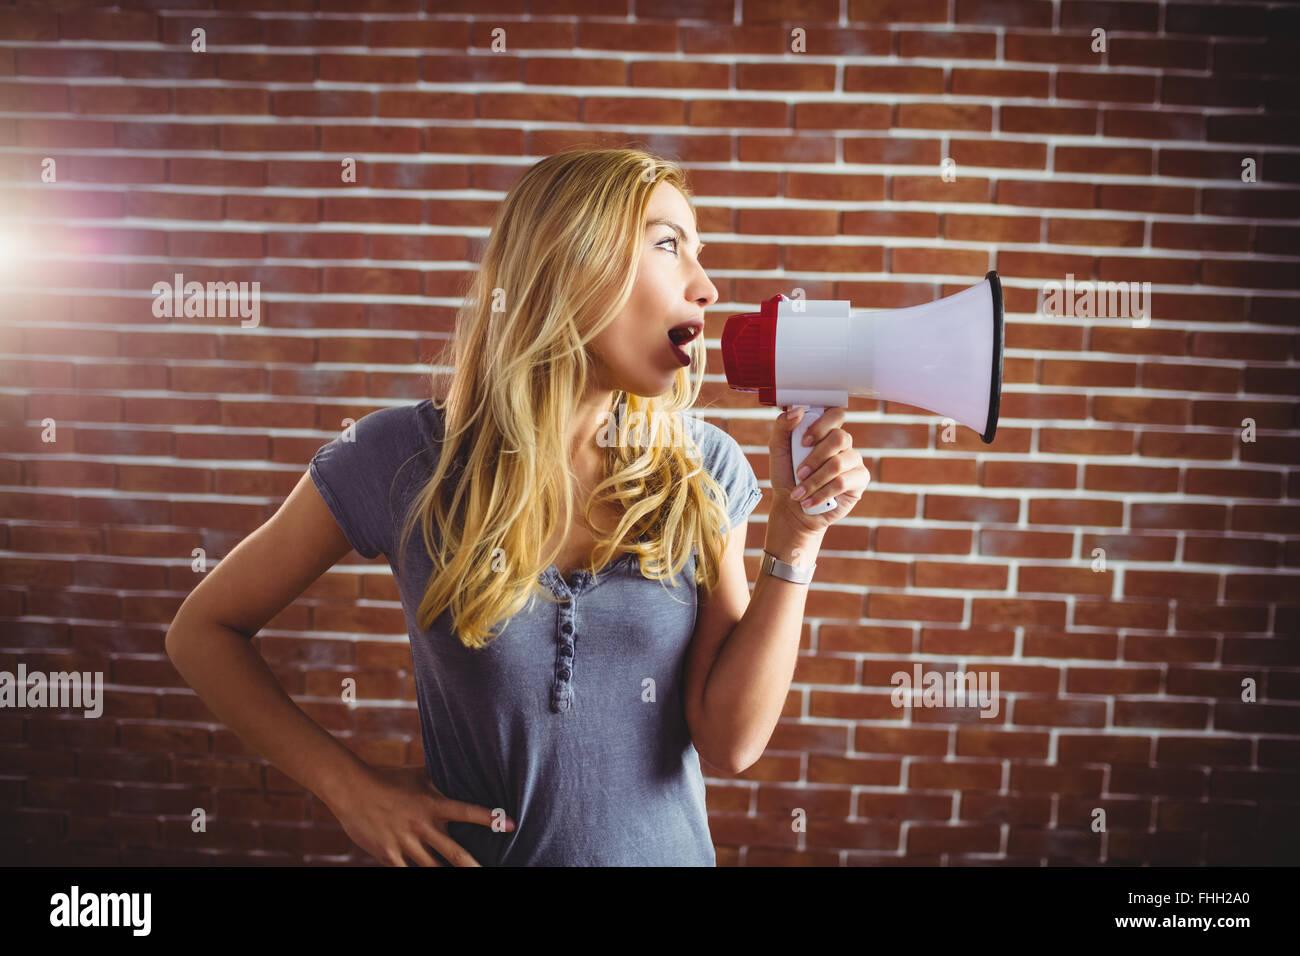 Woman yelling through megaphone - Stock Image